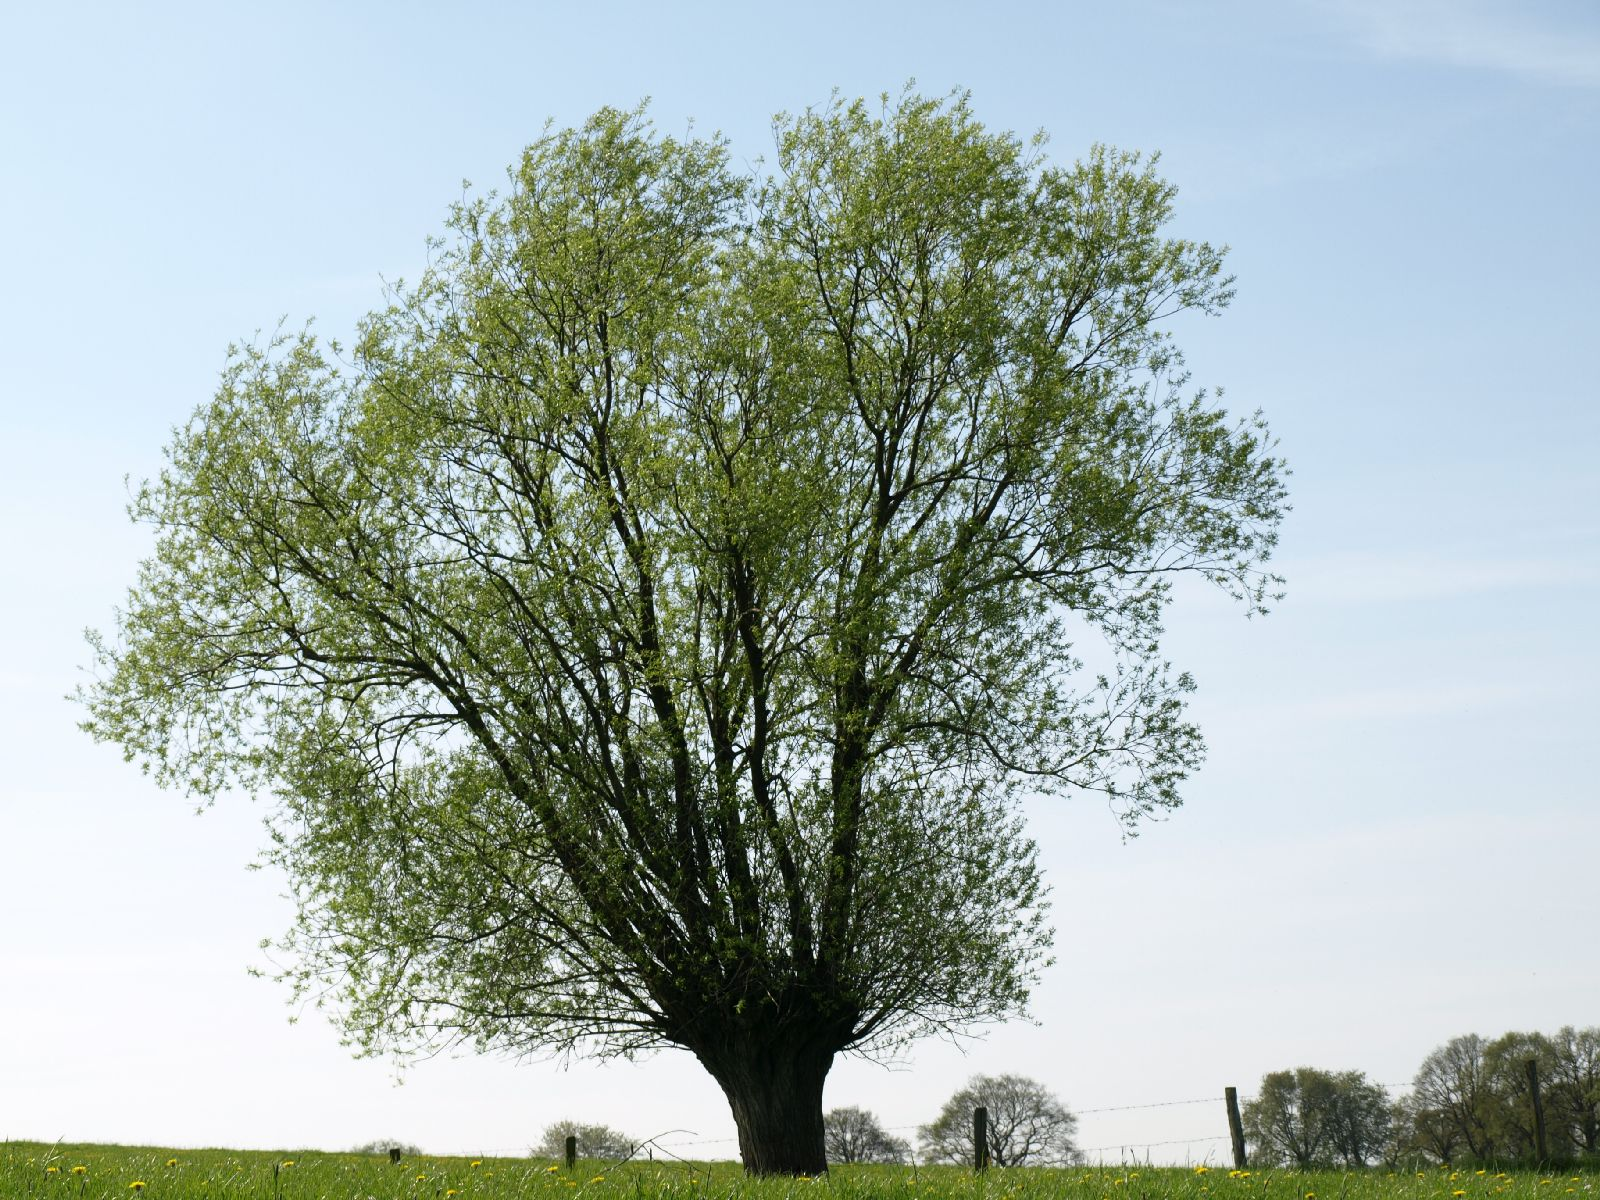 Pflanzen-Baum-Foto_Textur_B_P5042394